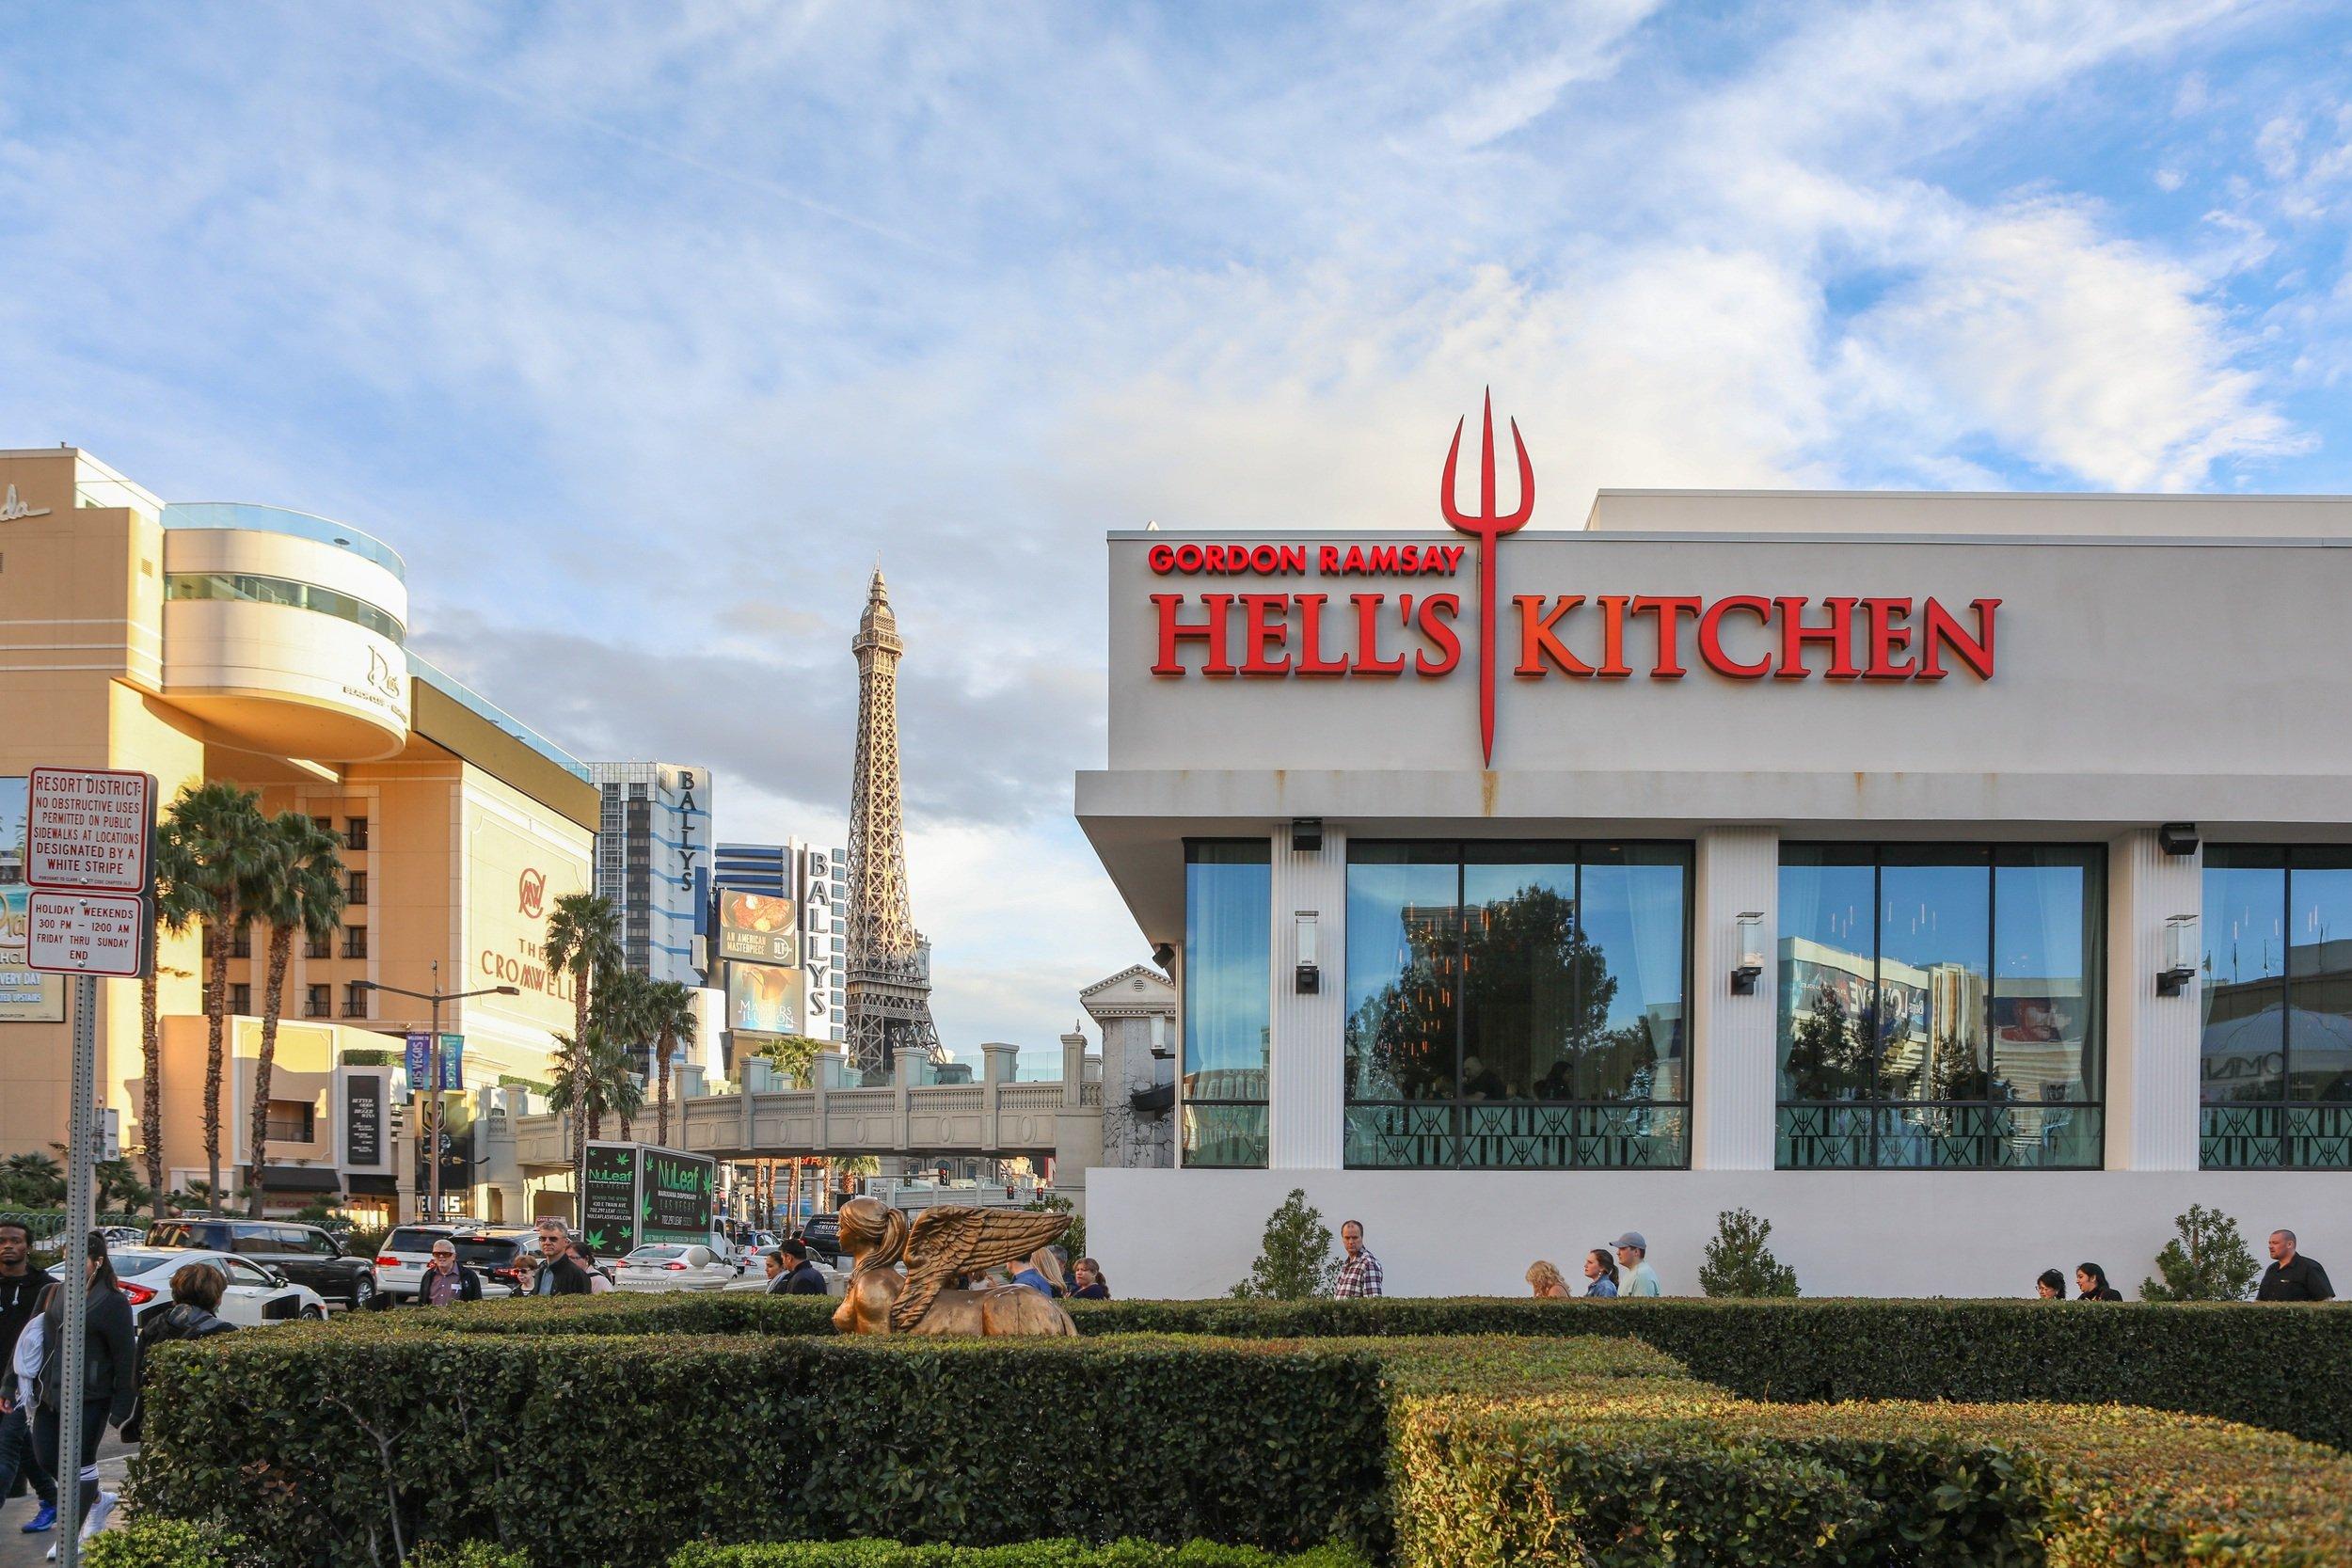 Gordon Ramsey's Hell's Kitchen in Las Vegas